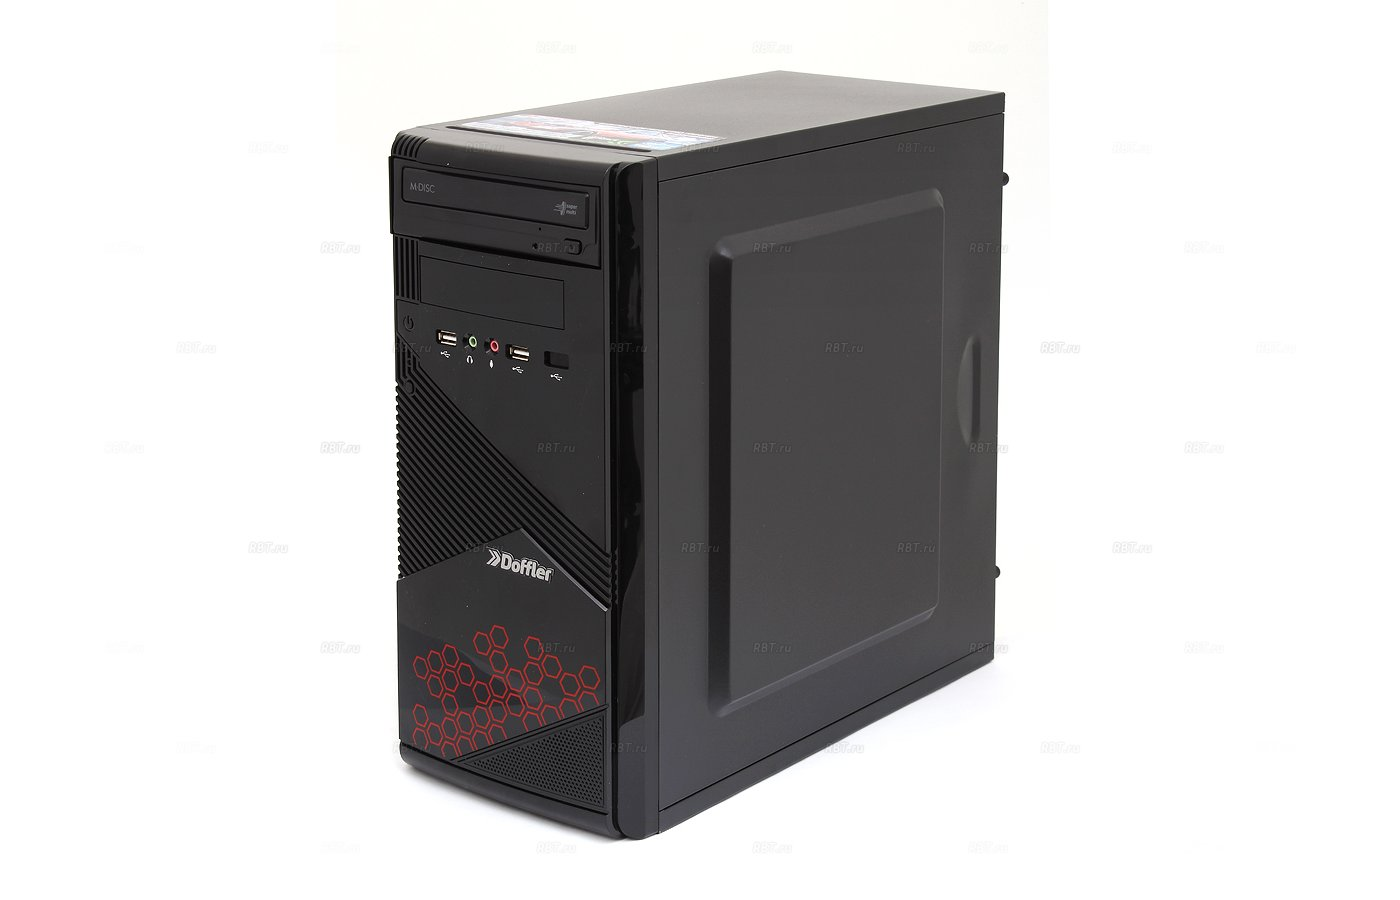 Системный блок Doffler i002N Game intel i5 520M x2 2.4Gh/8Gb/1Tb/GT740 2Gb/DVDRW/DOS